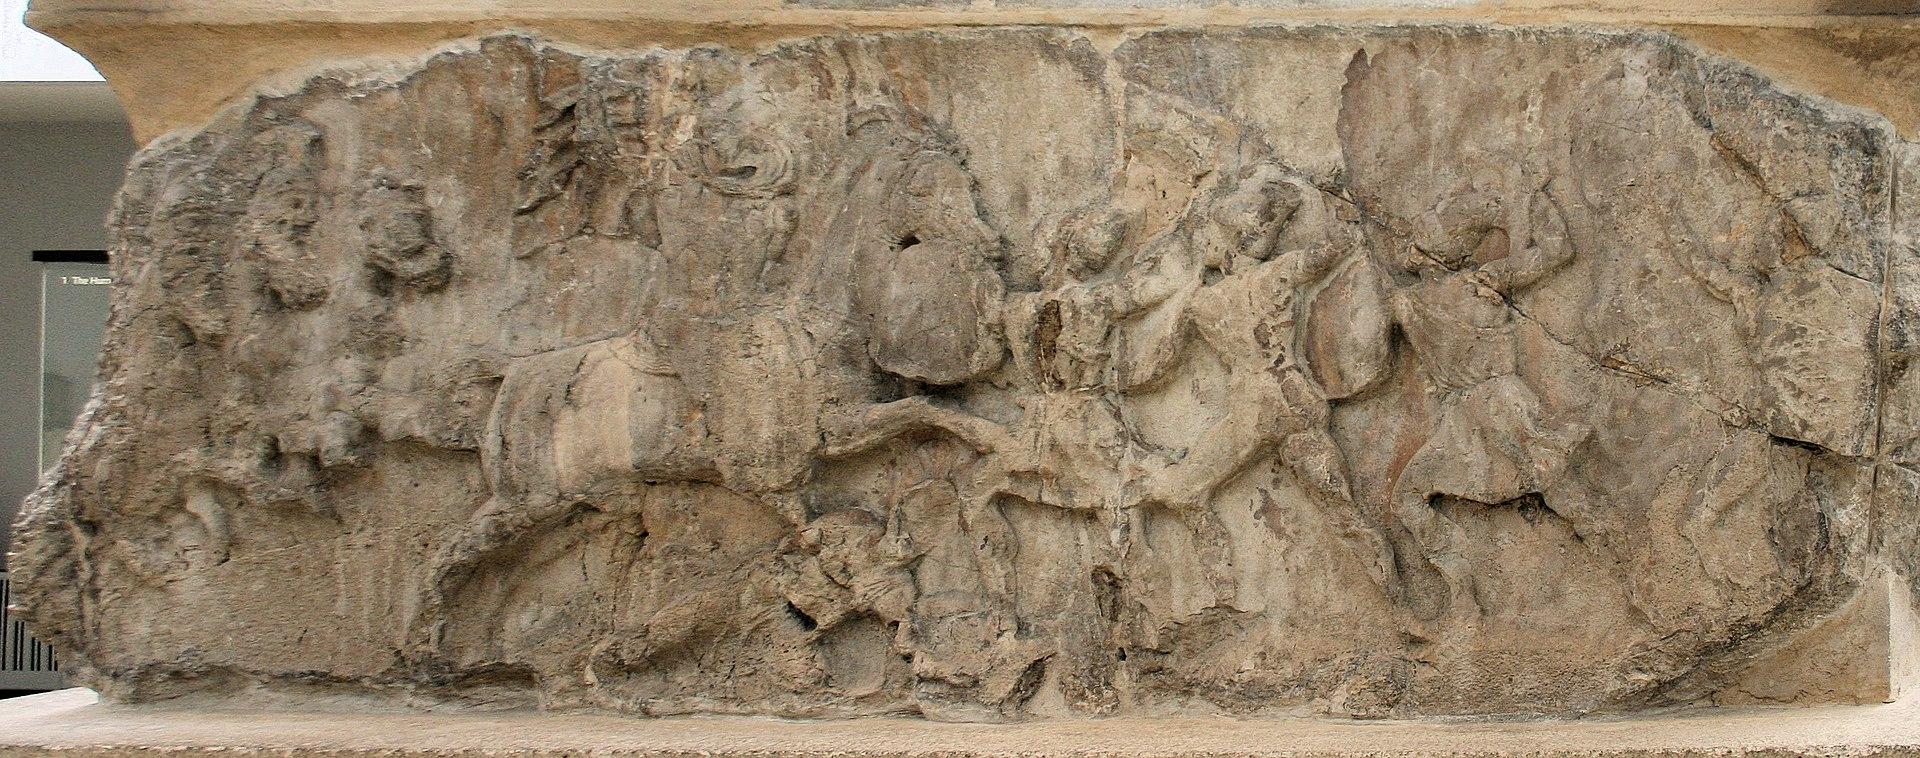 Tomb of Payava Battle scene.jpg